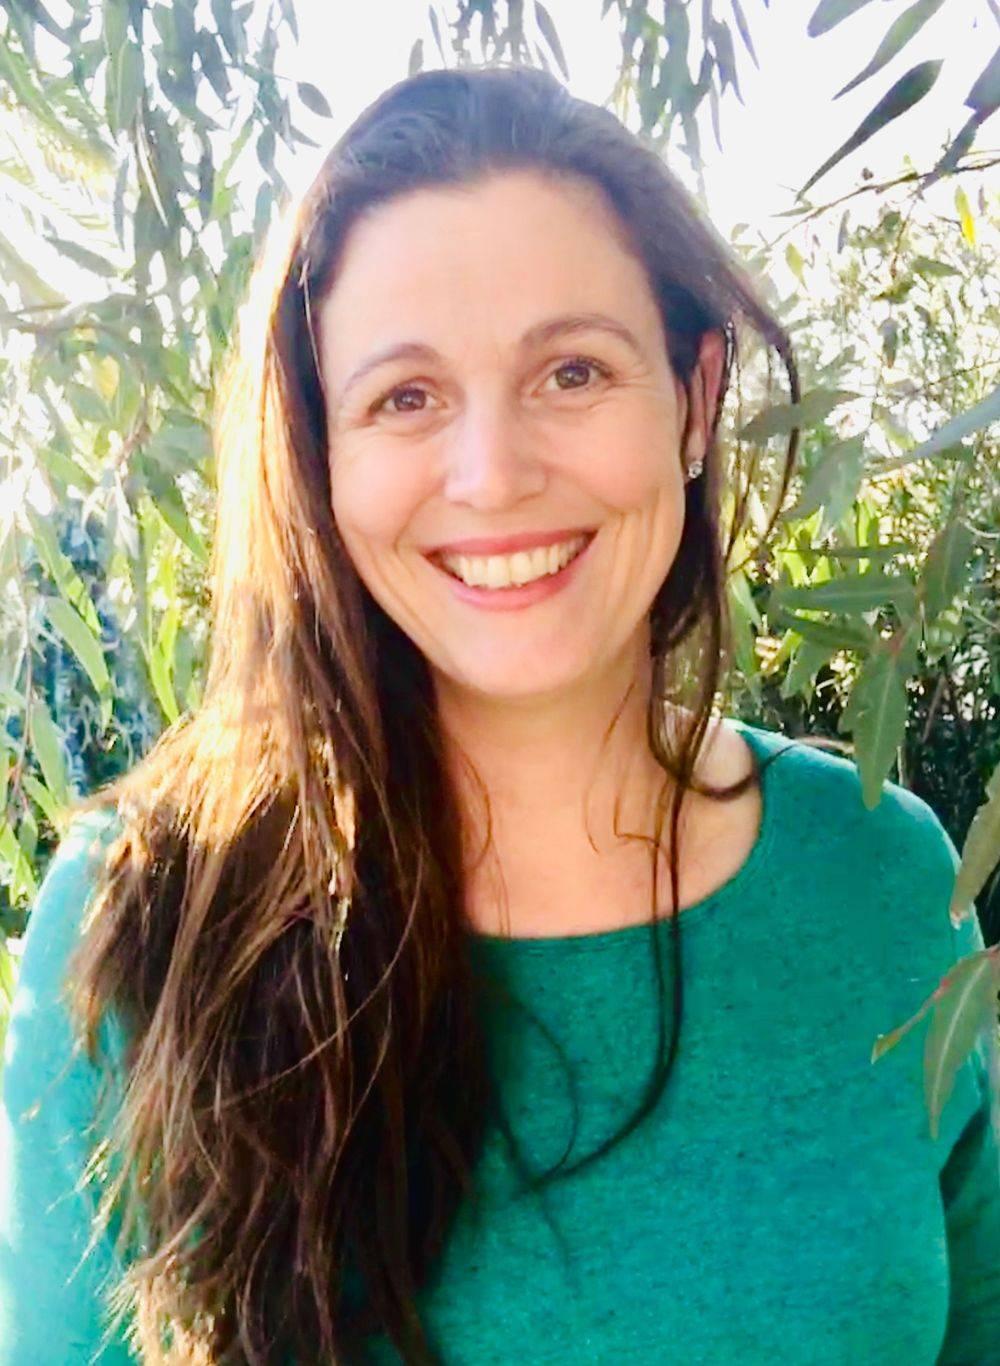 Trauma Therapist Counselor Flagstaff EMDR Anxiety Help